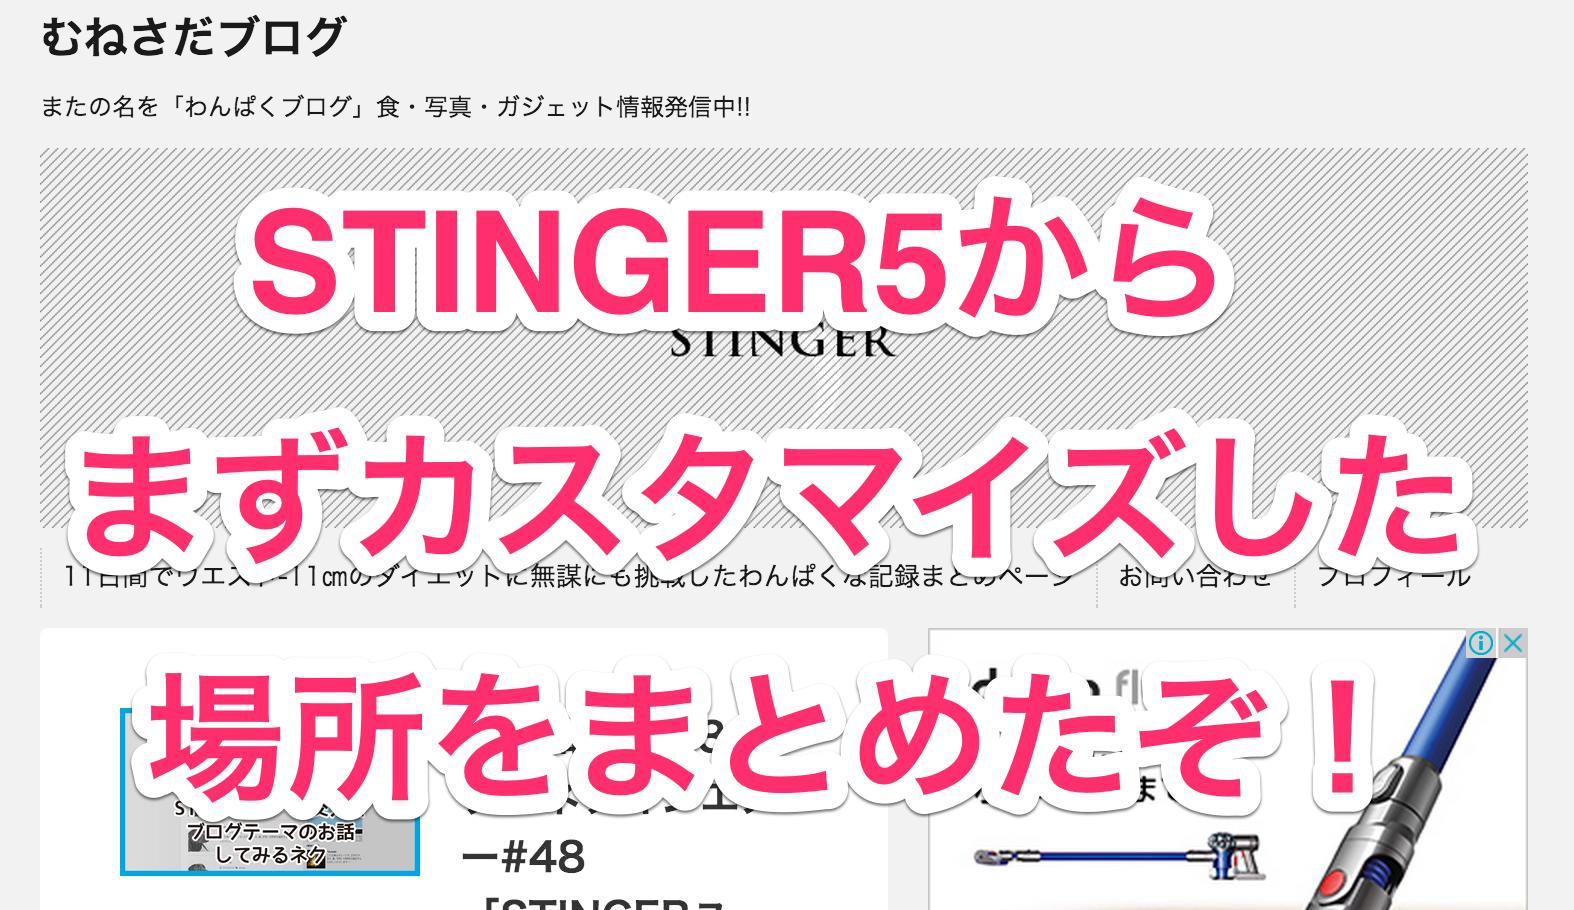 stinger5ver20141011_のカスタマイズ_—_WordPress 2